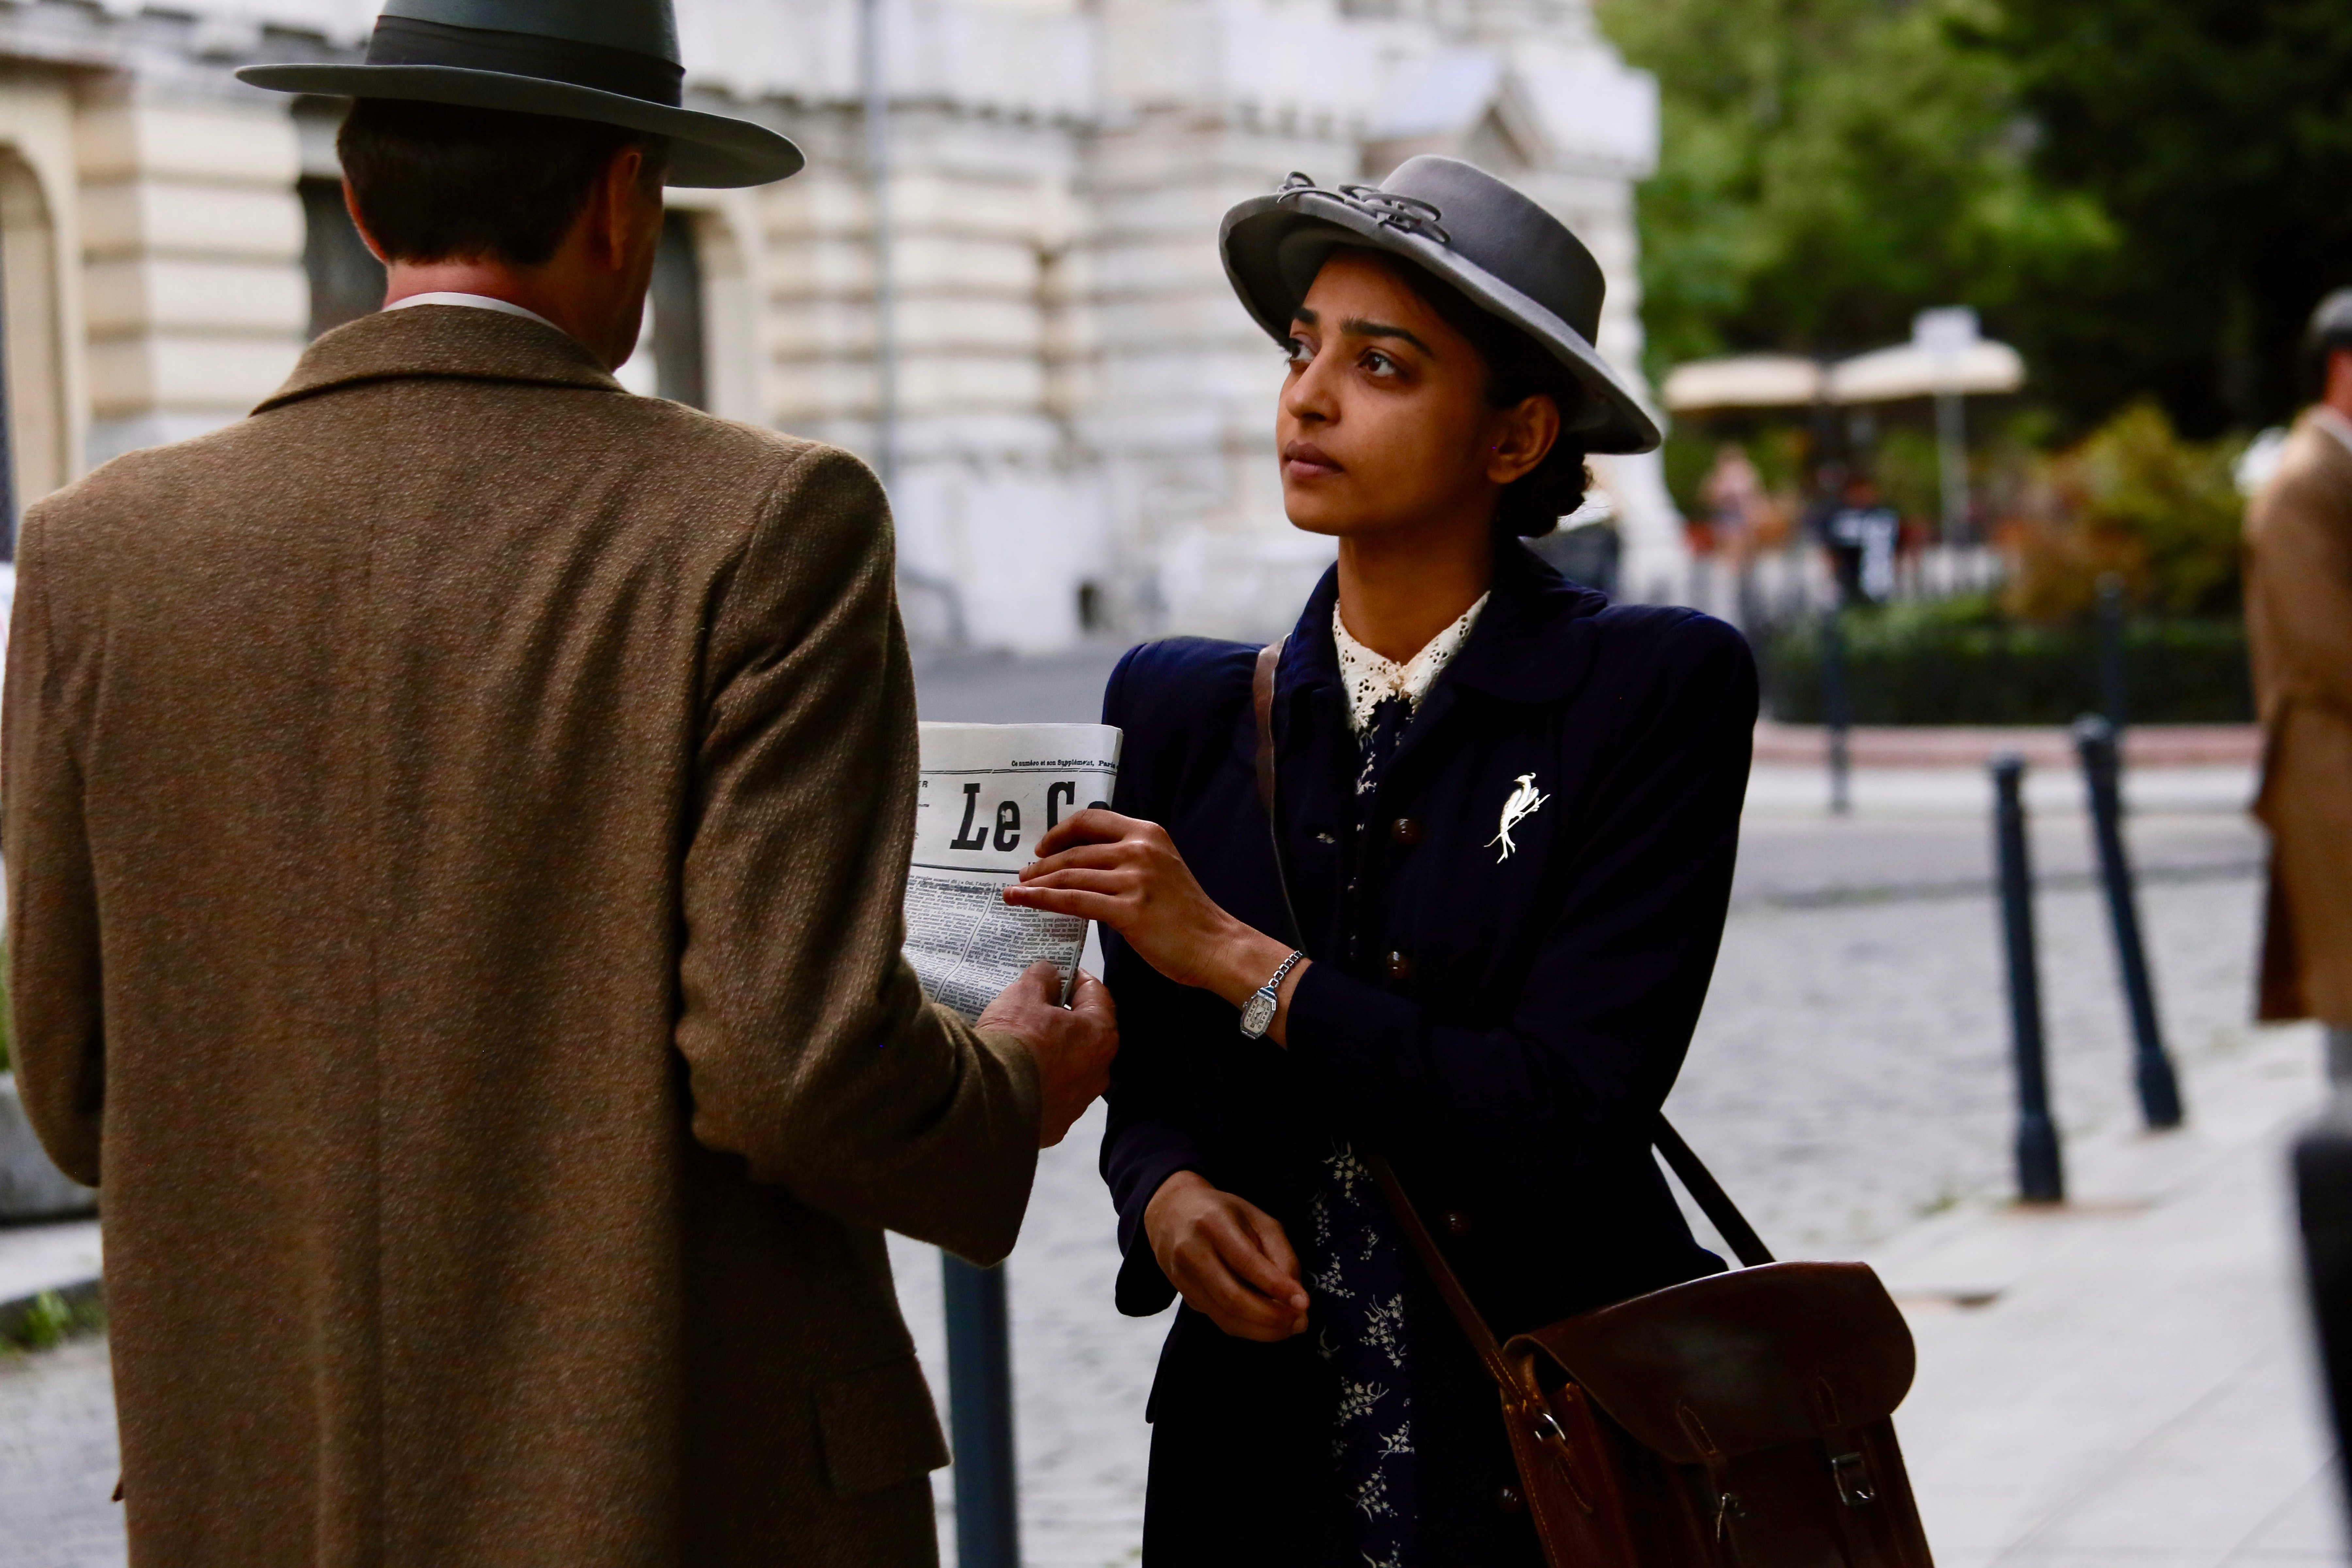 Radhika Apte as Noor Inayat Khan in 'A Call to Spy'